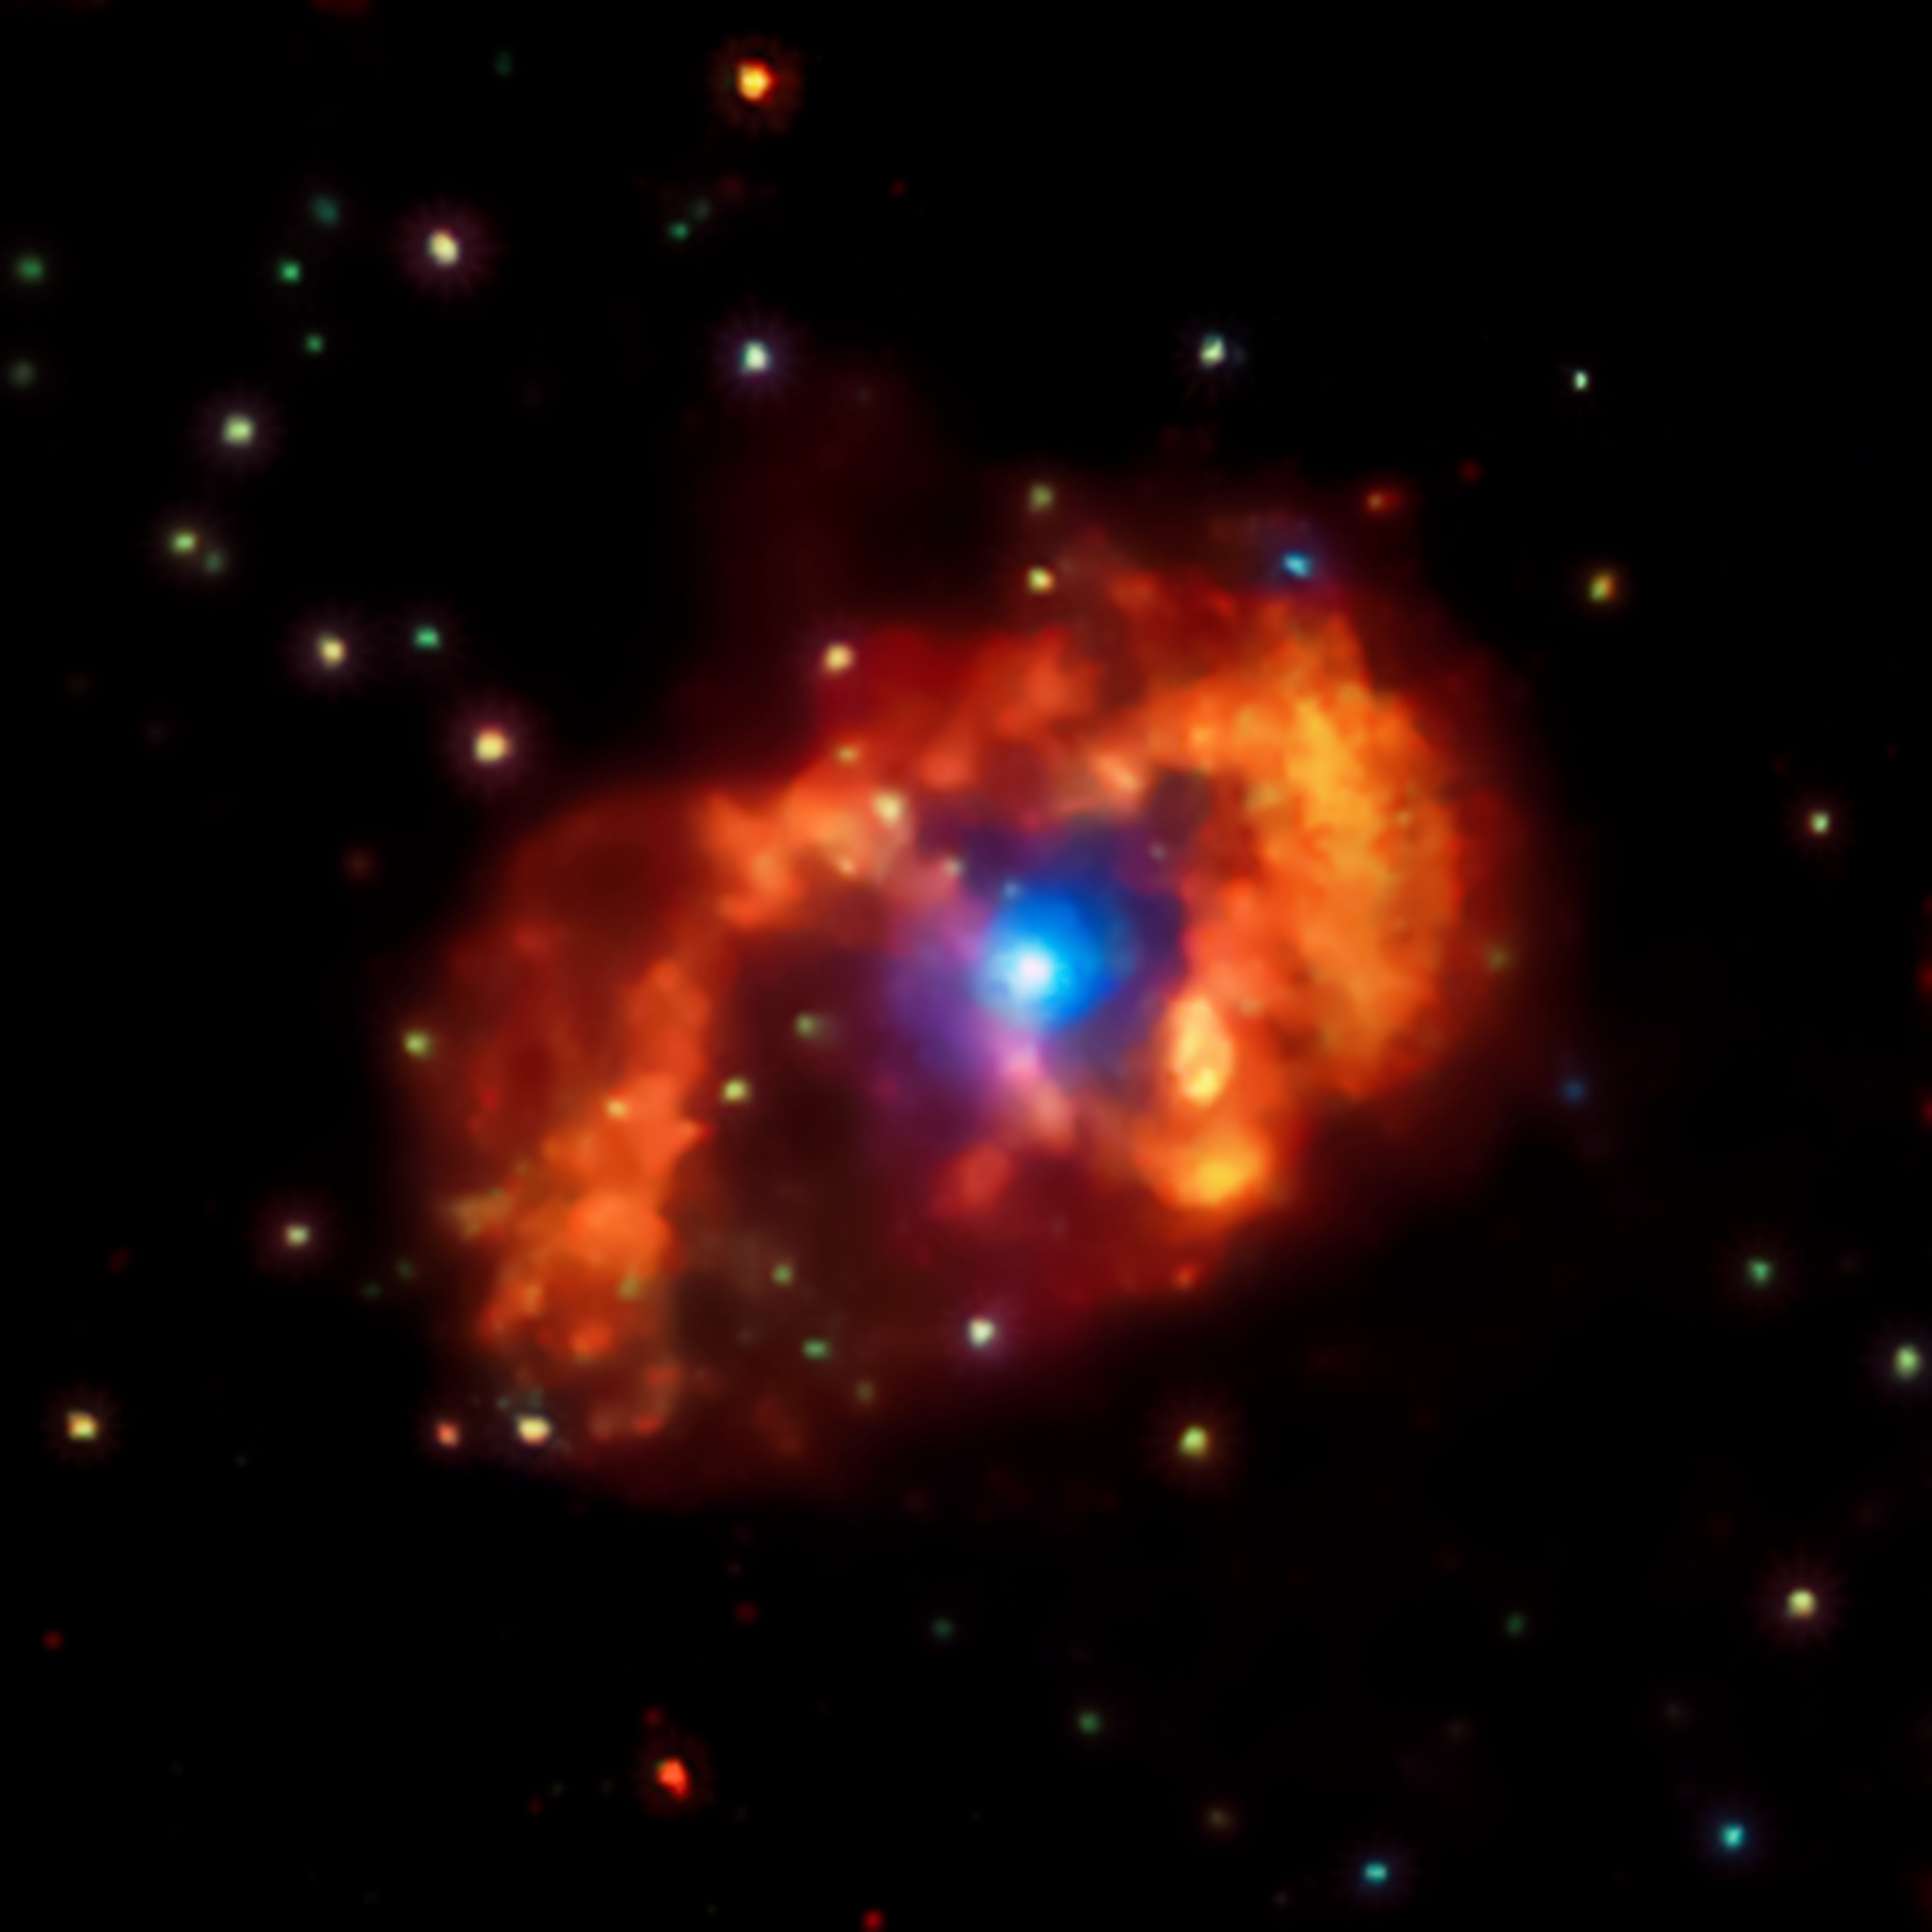 proton star nasa - photo #47